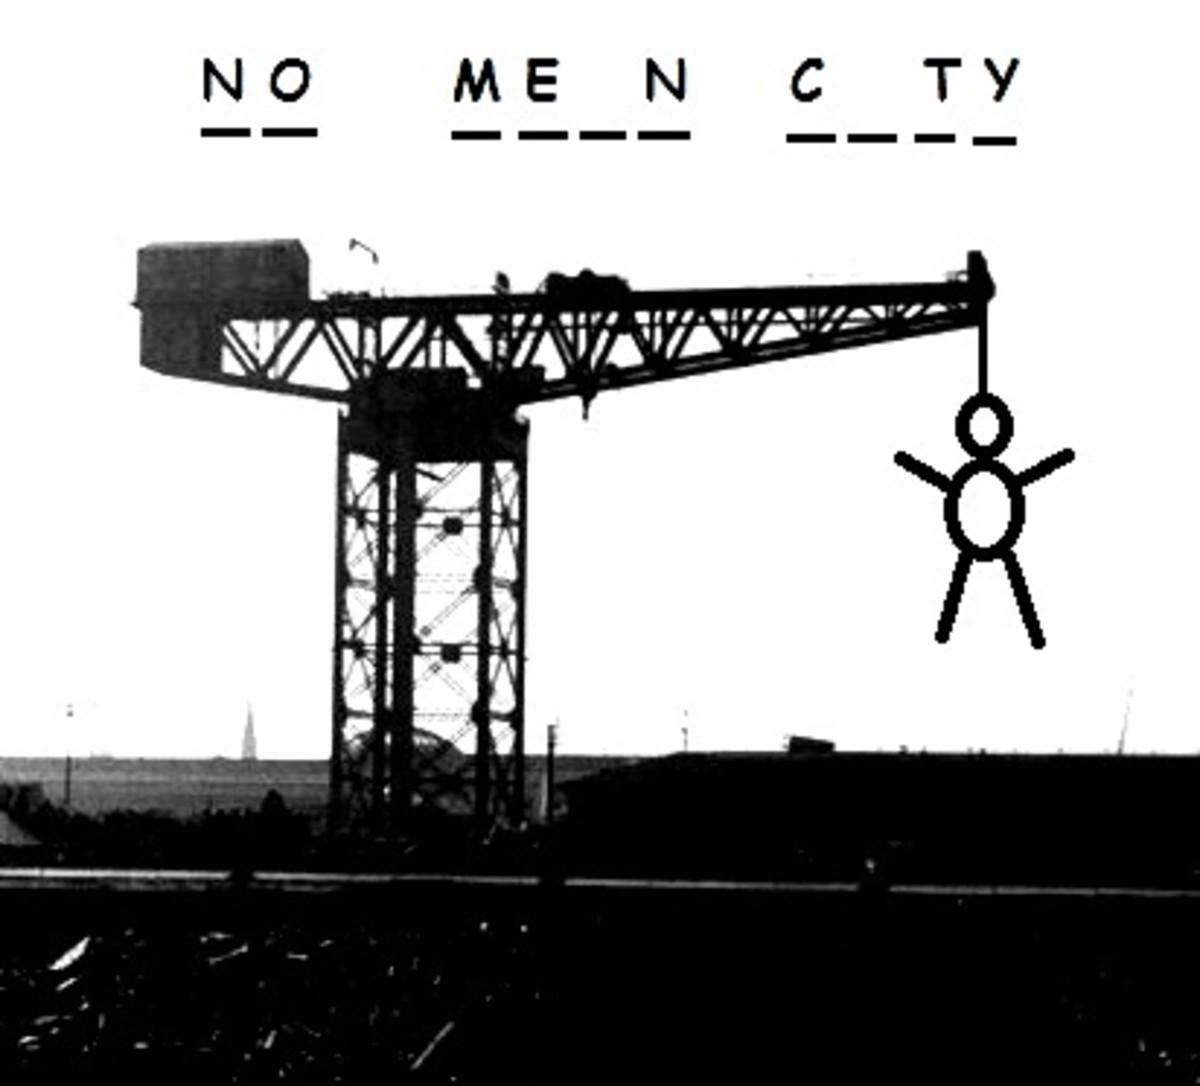 glasgow - no mean city